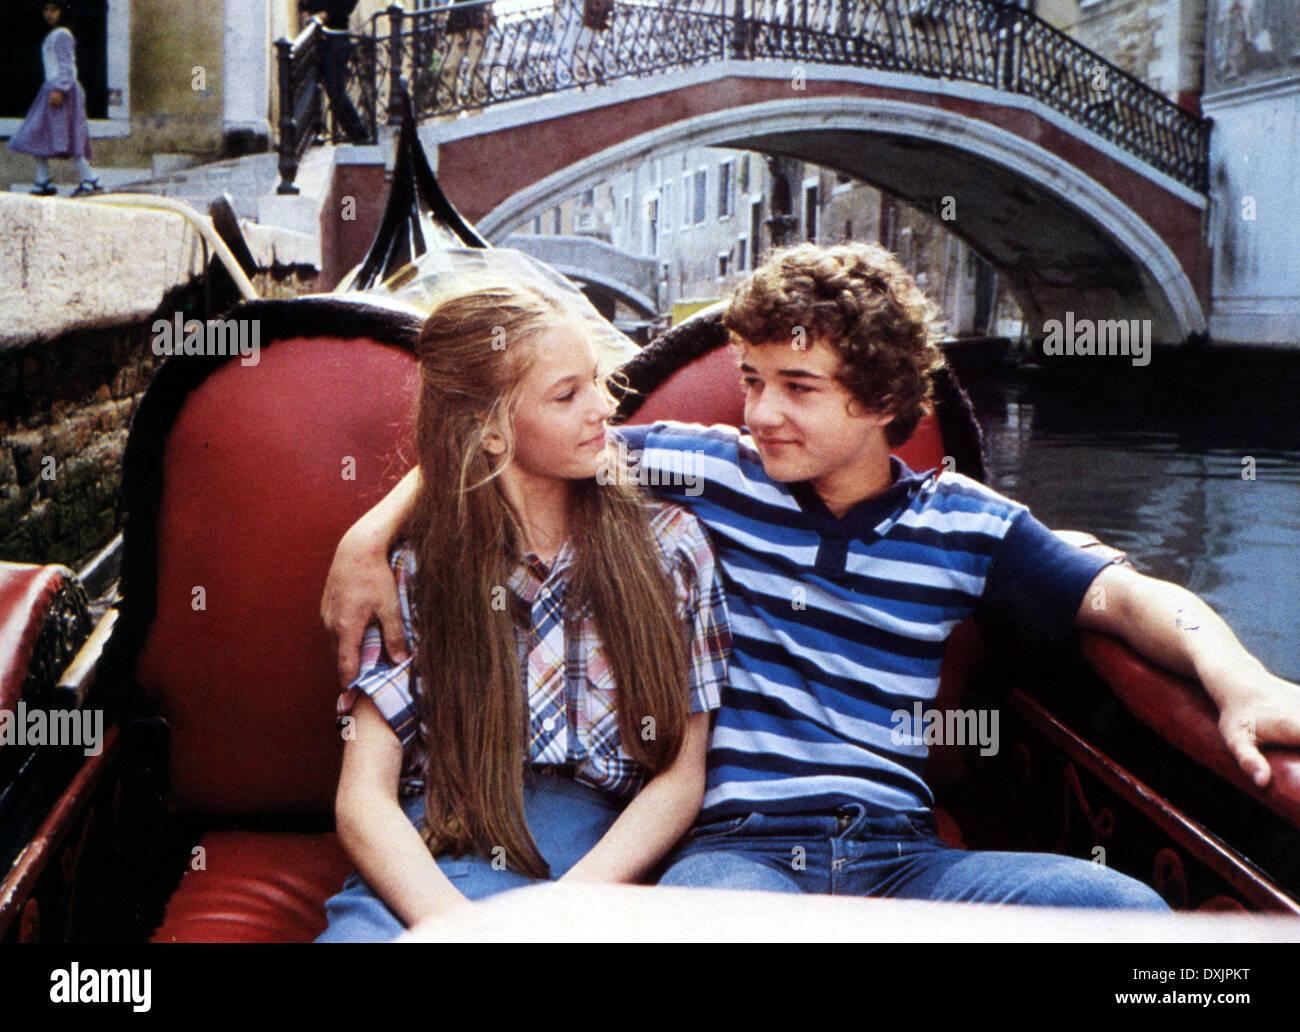 A Little Romance Us Fr 1979 Diane Lane Thelonious Bernard